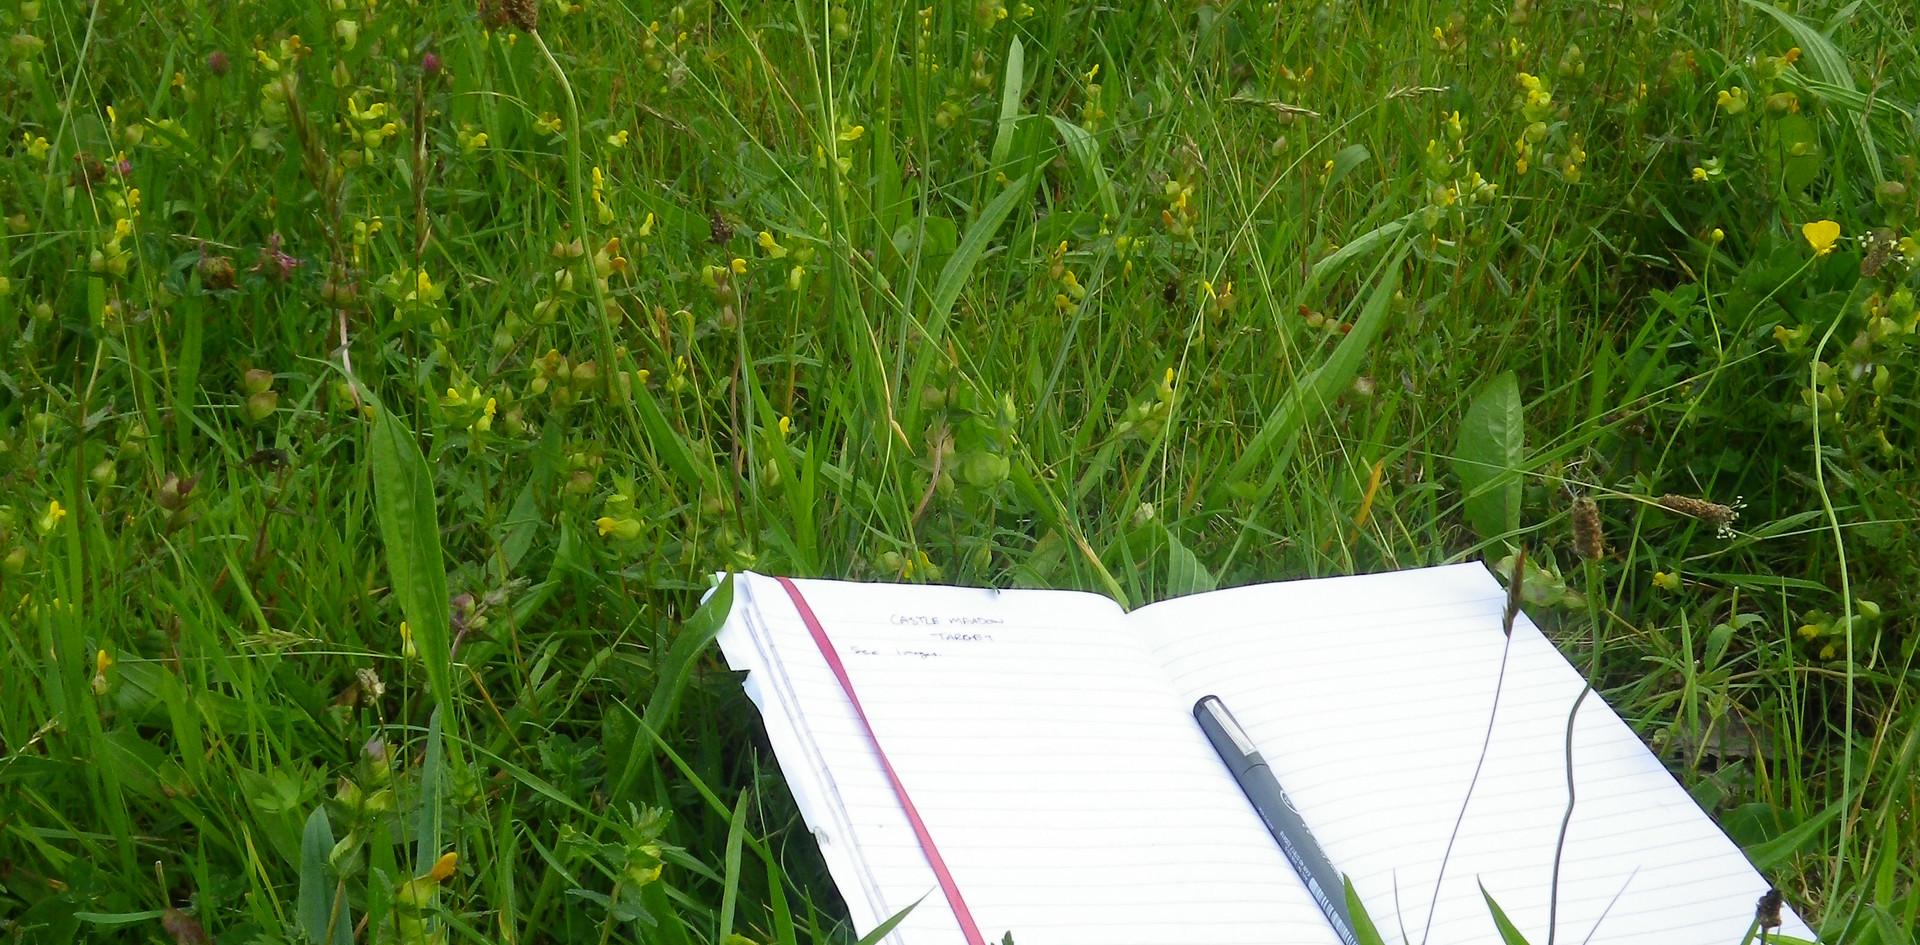 Condition assesment in grassland habitats